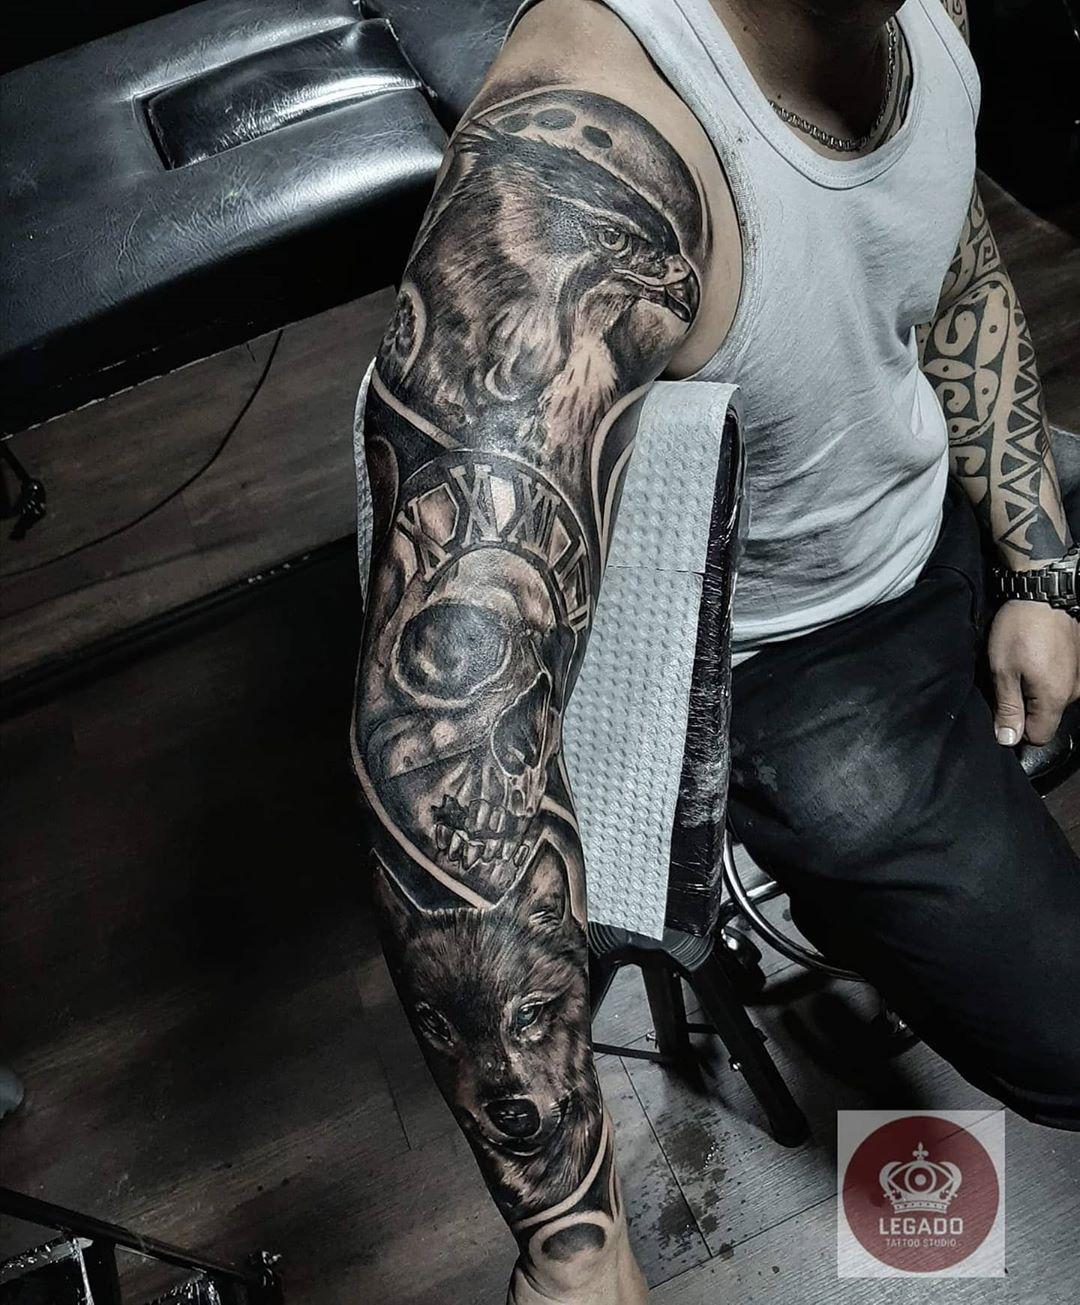 TATUAJE DE HACE DOS AÑOS,LA IDEA DE TATUAR ES TRASMITIR CONFIANZA,TATUAJE REALIZADO EN 9 HORAS 🤗🤗🤗🤗🤗🤗🤗🤗🤗🤗🤗🤗 Artista:@markedriller 🌷🌺🌷🌺🌷🌺🌷🌺🌷🌺🌷🌺🌷🌺🌷 #tattoo #tattoos #blacktattoo #newtattoo #tattooink #tattoolove #blackandgreytattoo #tattoo #tattoos #tattooed #tattooartist #tattooart #tattoolife #instatattoo #guyswithtattoos #realistictattoo #tattooapprentice #tattoomagazine #boyswithtattoos #tattooartistmagazine #tattooaddict #menwithtattoos #blackworktattoo #tattoodo #i